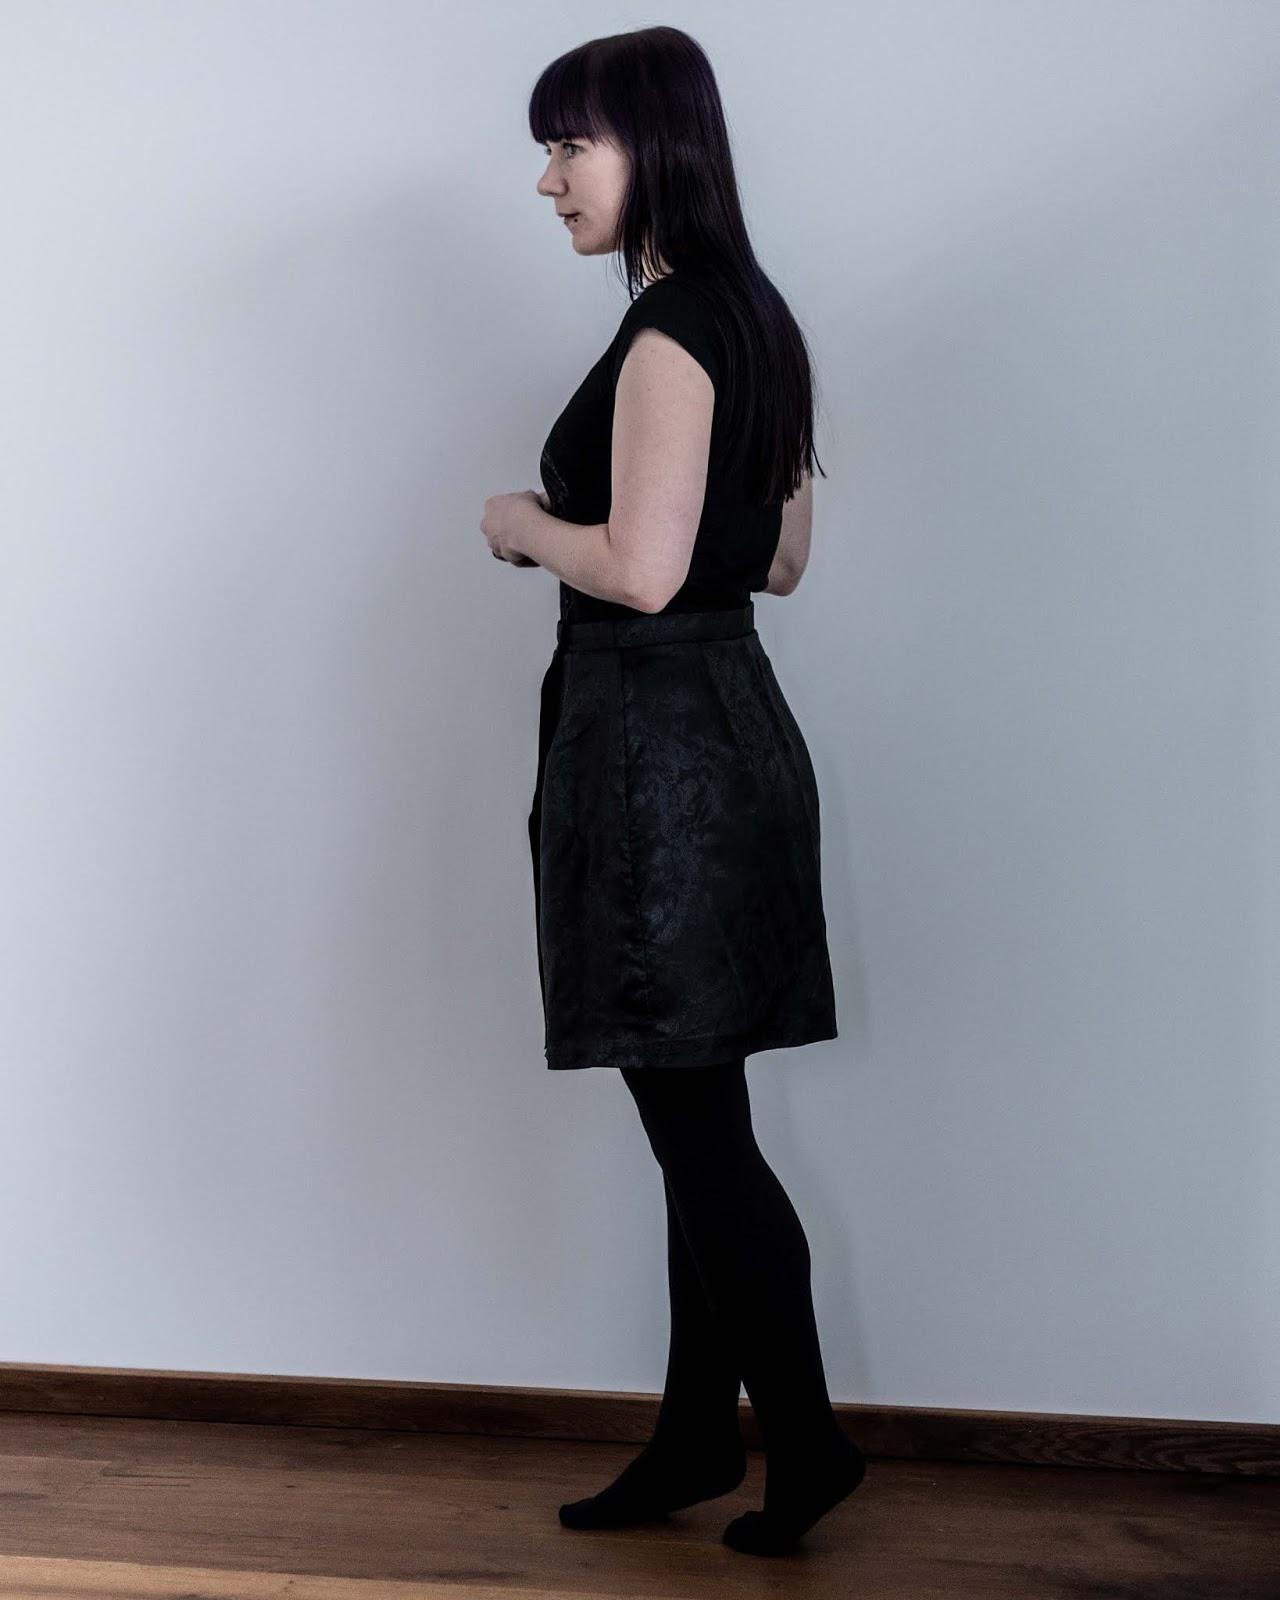 Nita wrap skirt sew diy sewing pattern made by minn's things side view